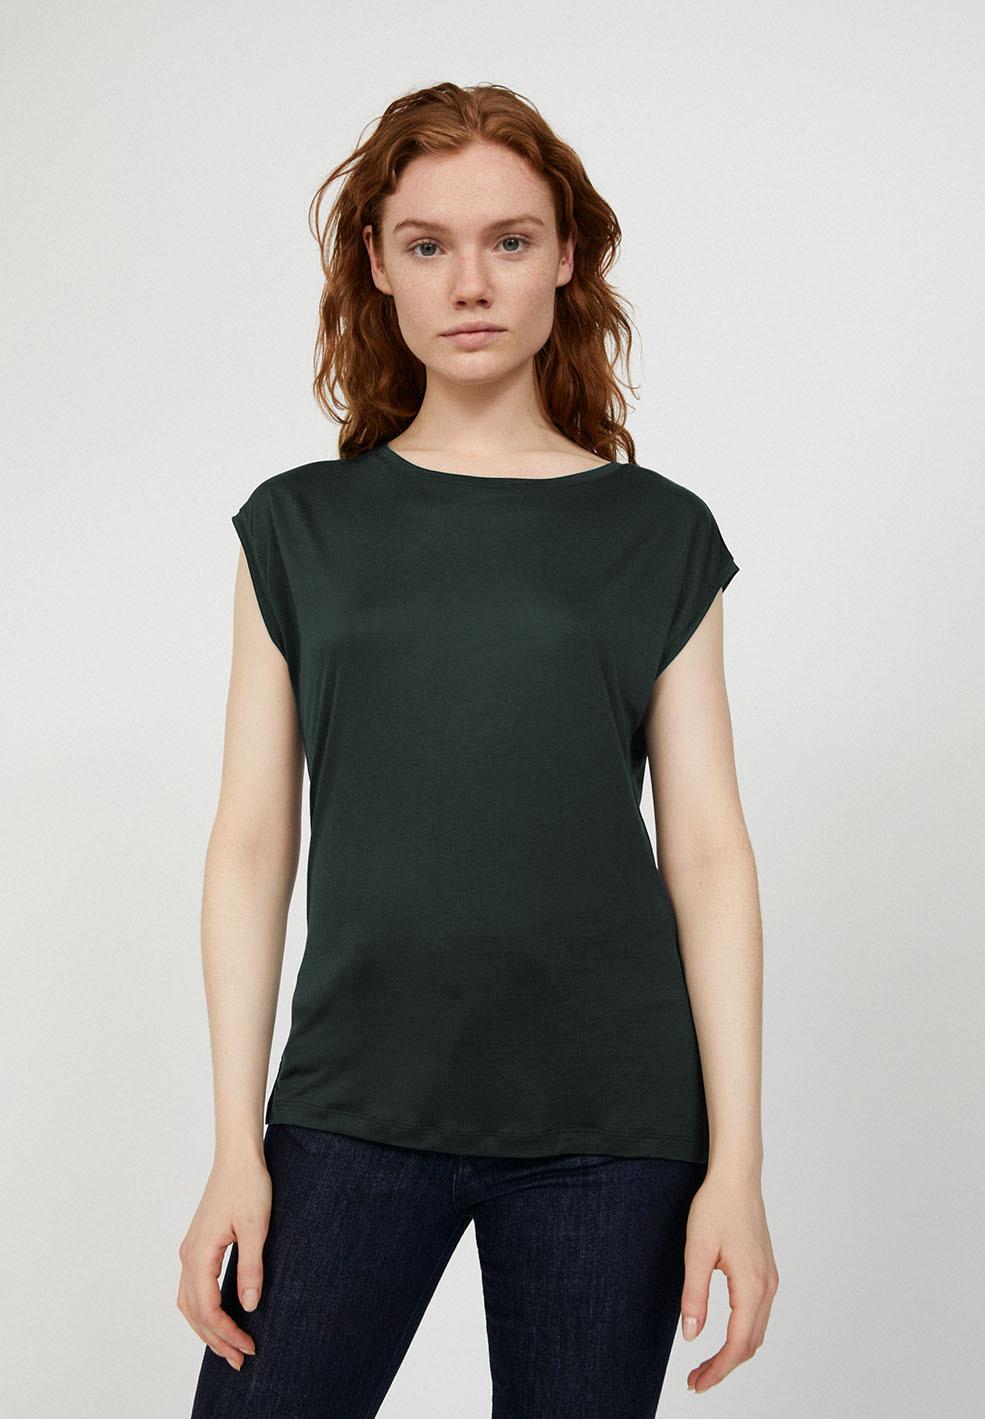 ARMEDANGELS-JILAA-Shirt-vintage-green-2